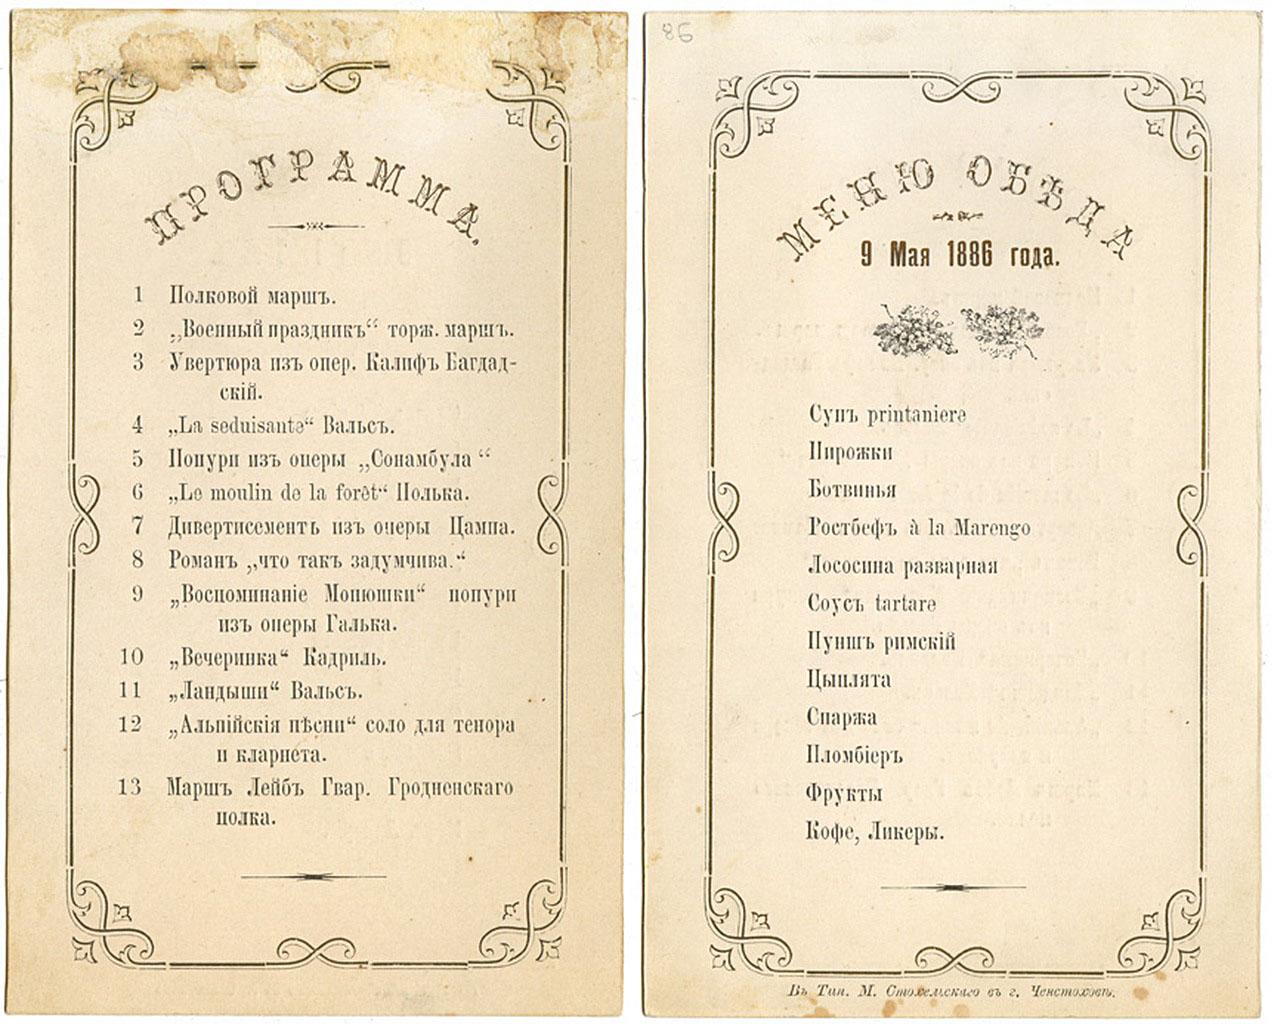 0_91a04_1bf13ec2_origМеню обеда. 9 мая 1886 года.